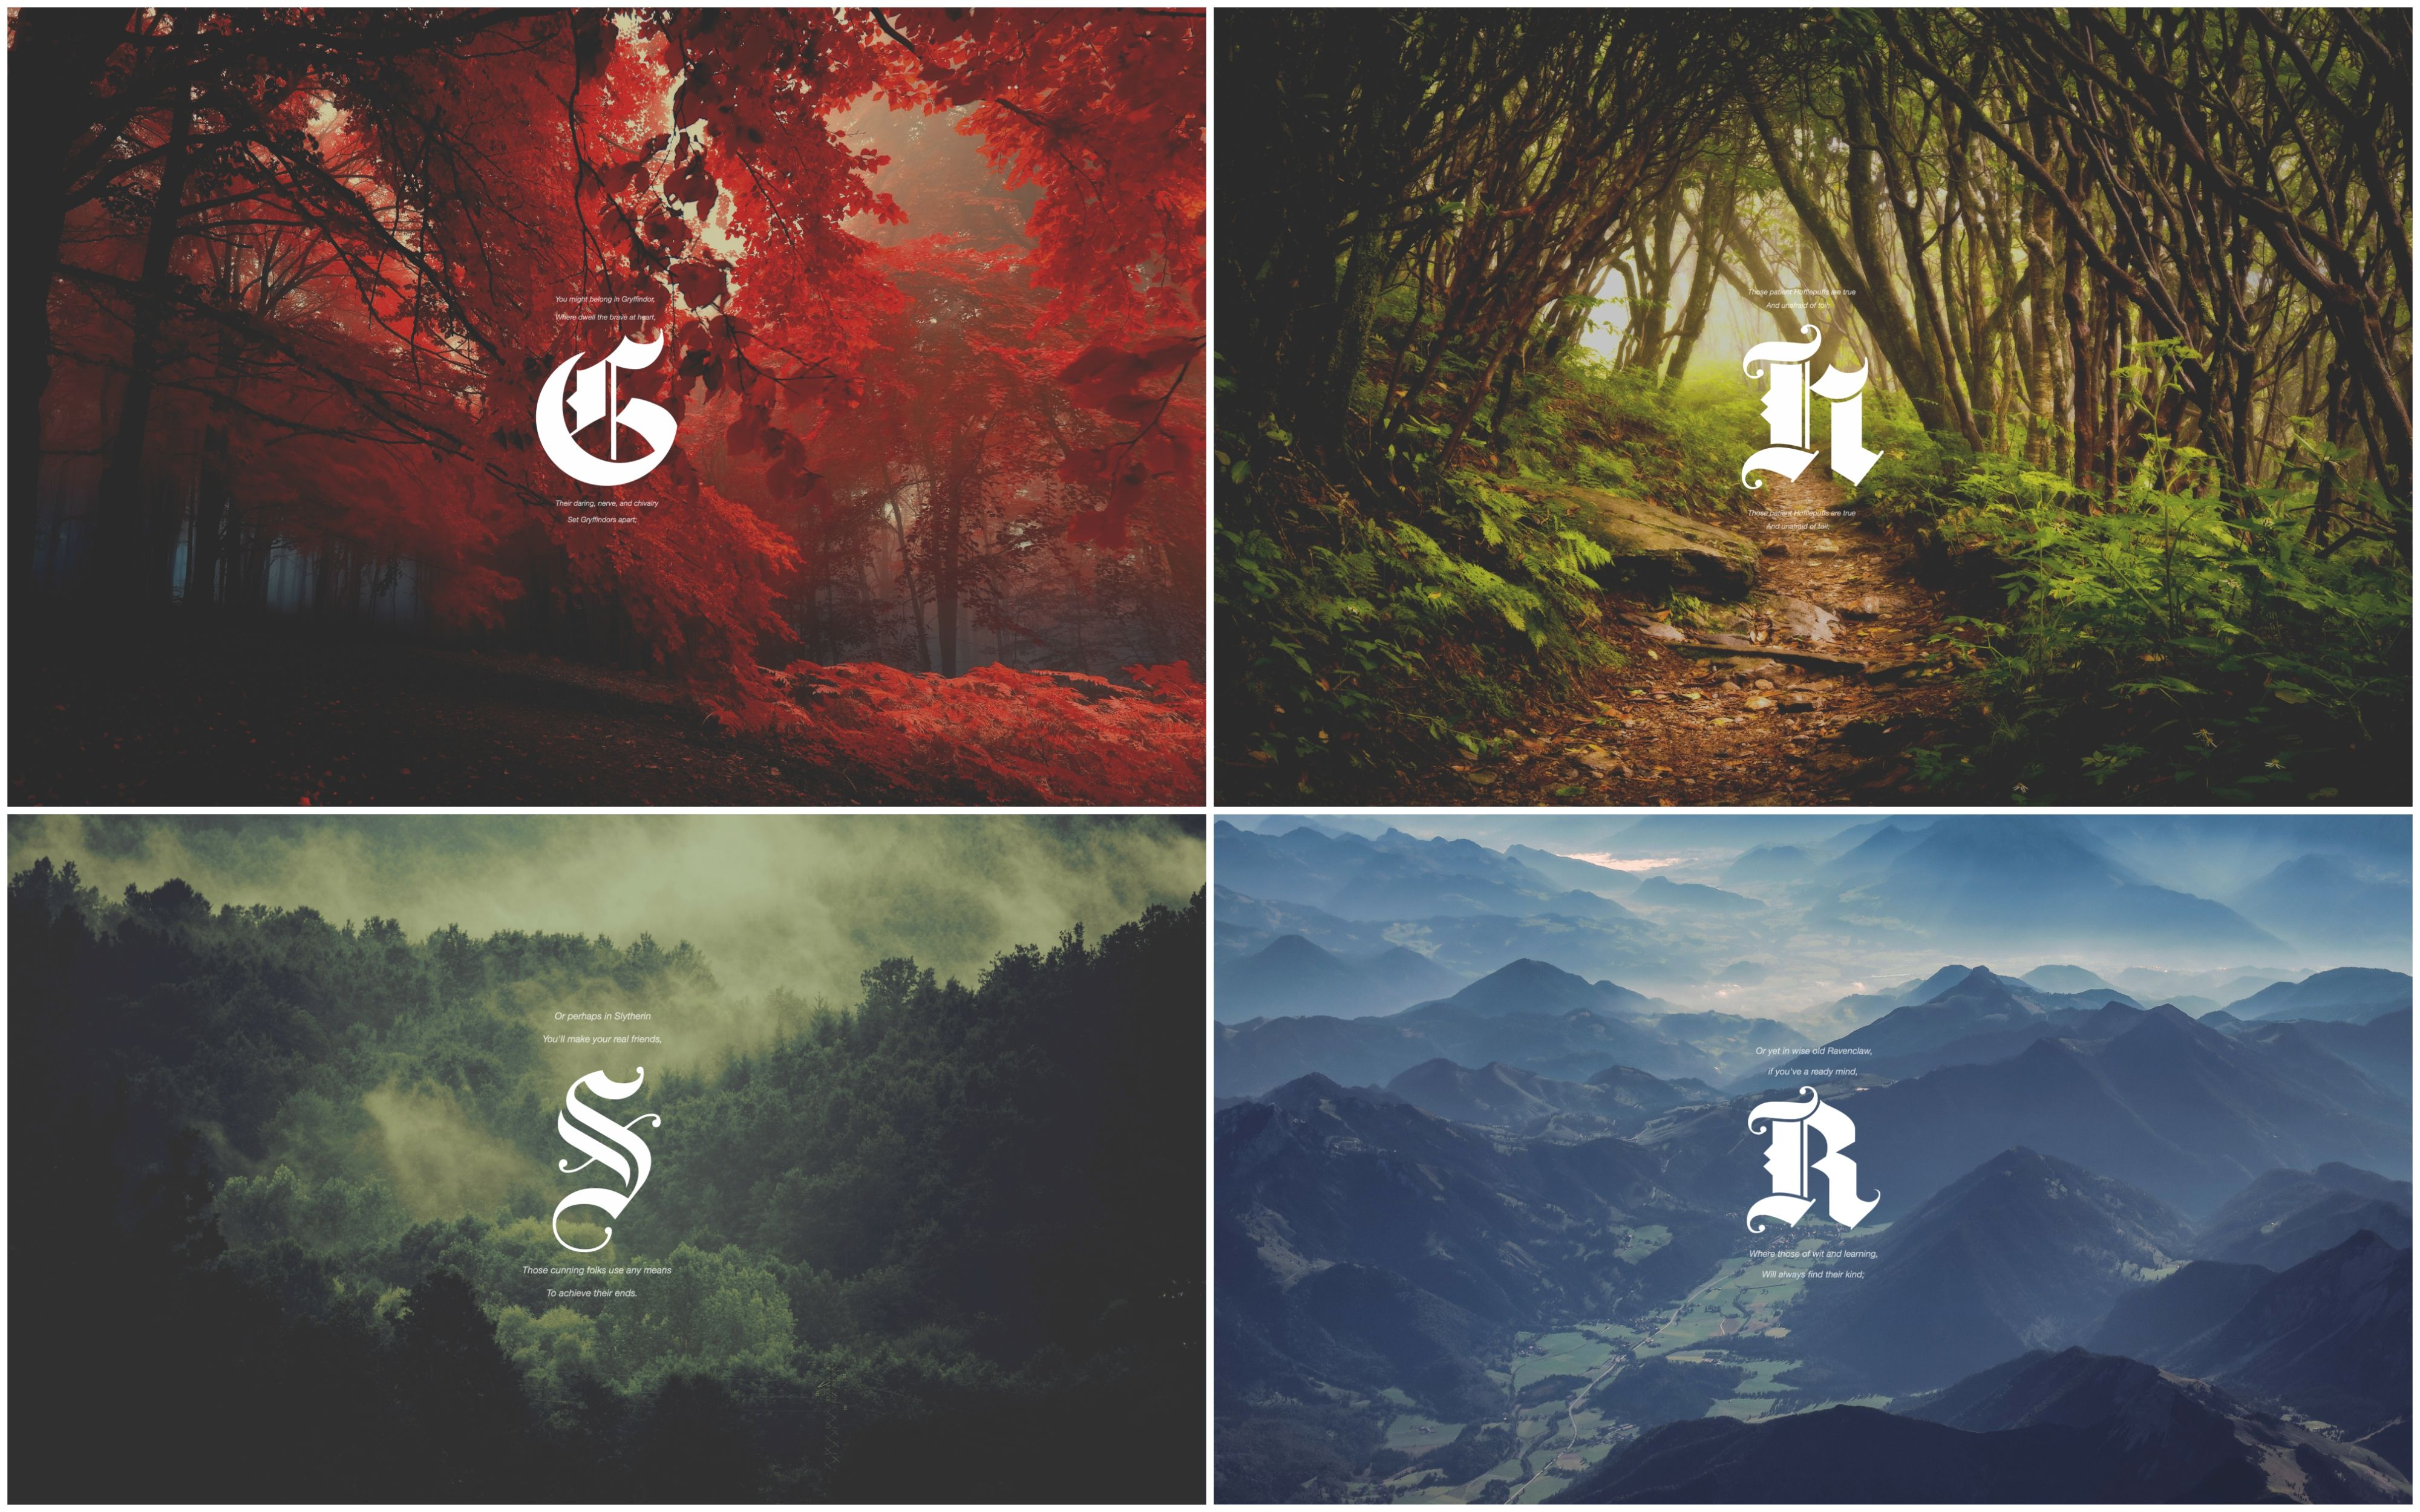 Harry Potter Landscape Wallpapers Top Free Harry Potter